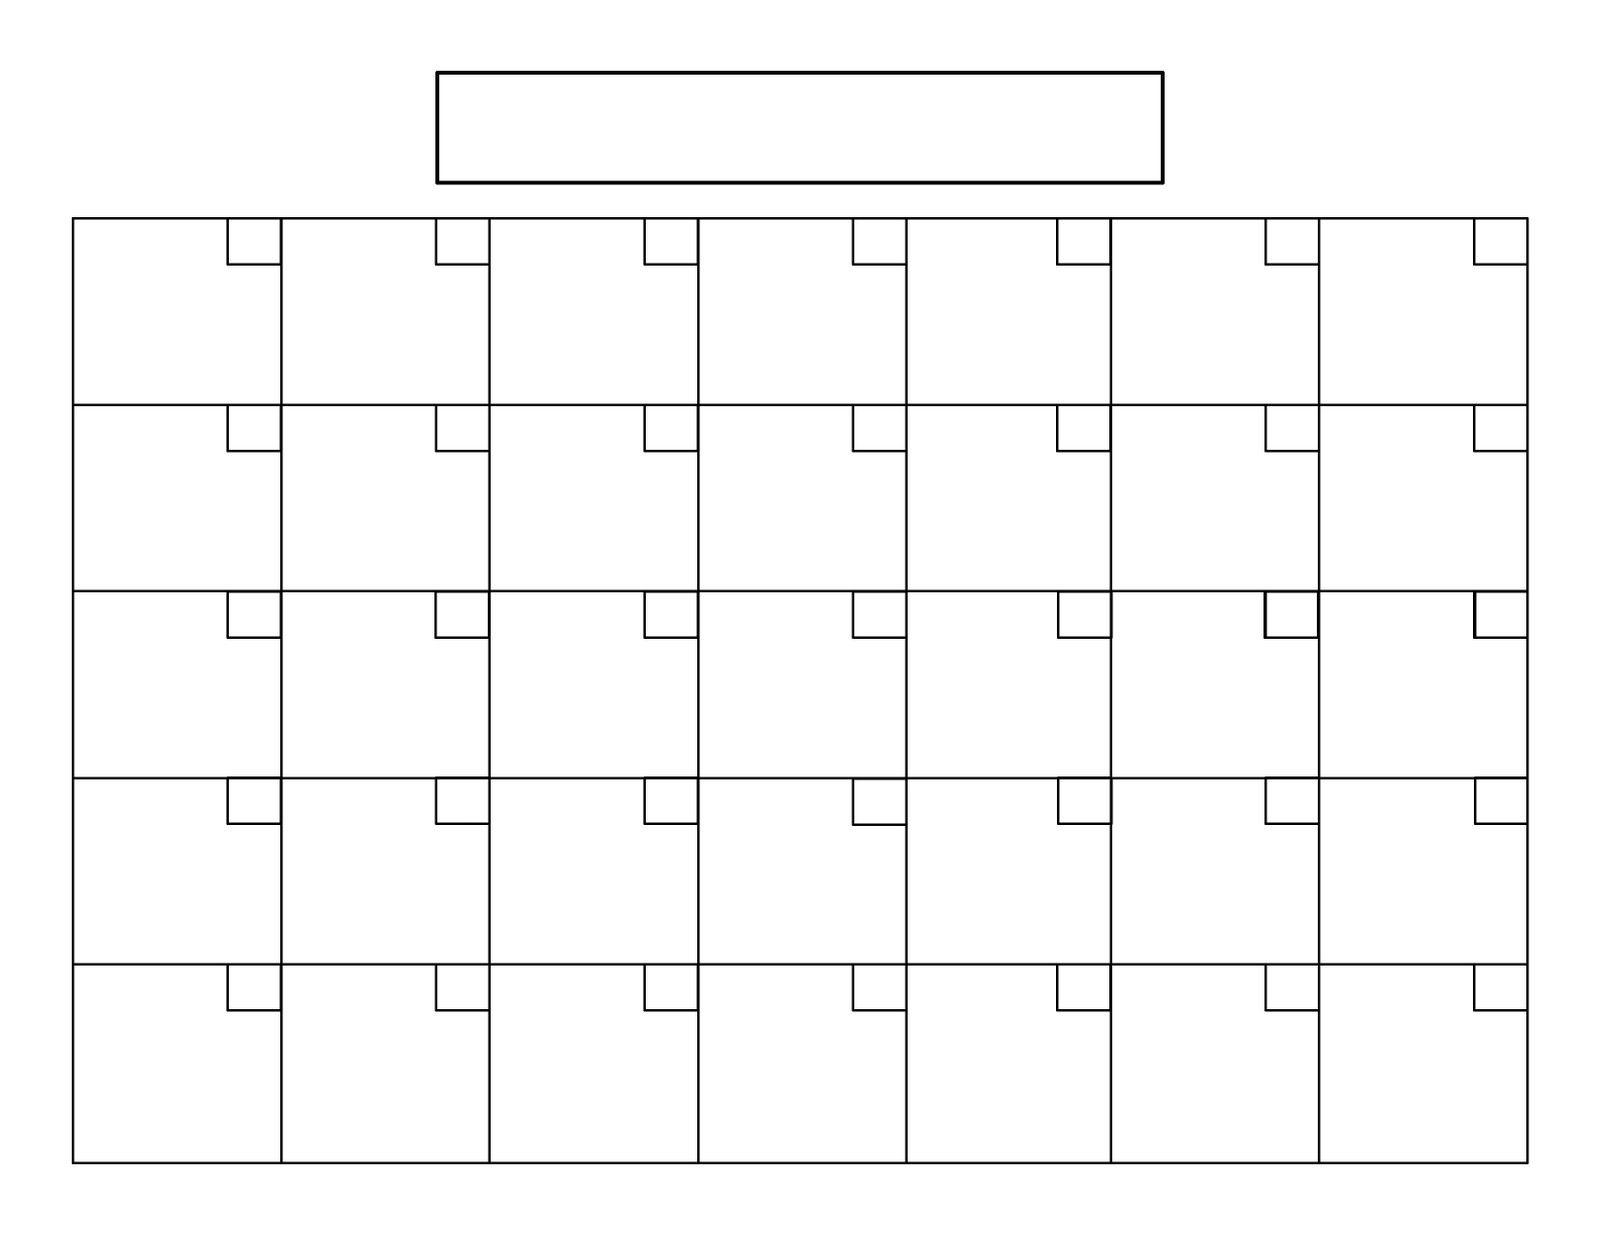 Пустой Календарь Больших Квадратов  Календарь | Пустой inside Blank 31 Day Calendar